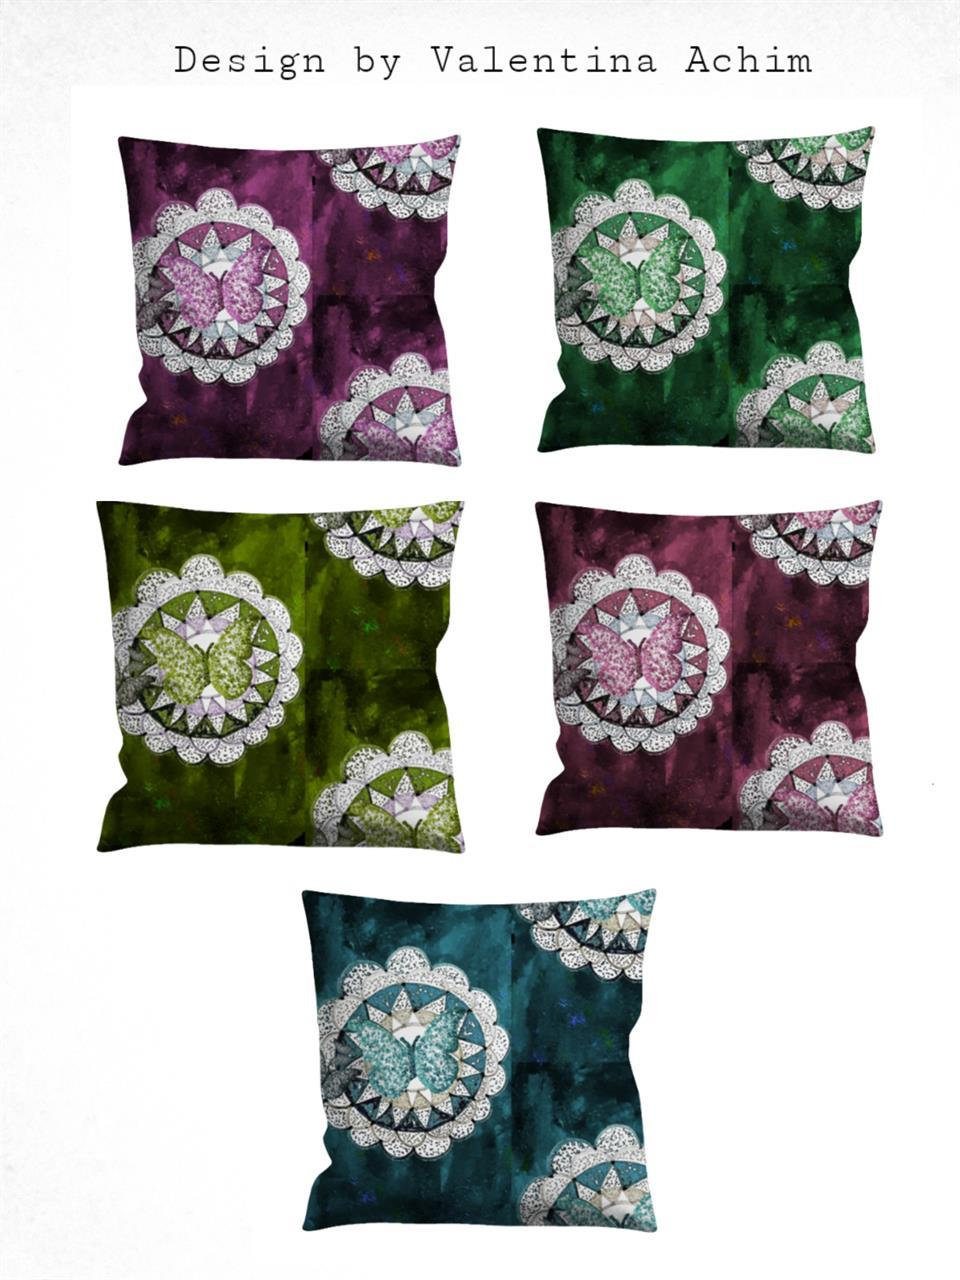 Design by Valentina Achim -kuddfodral i indisk stil